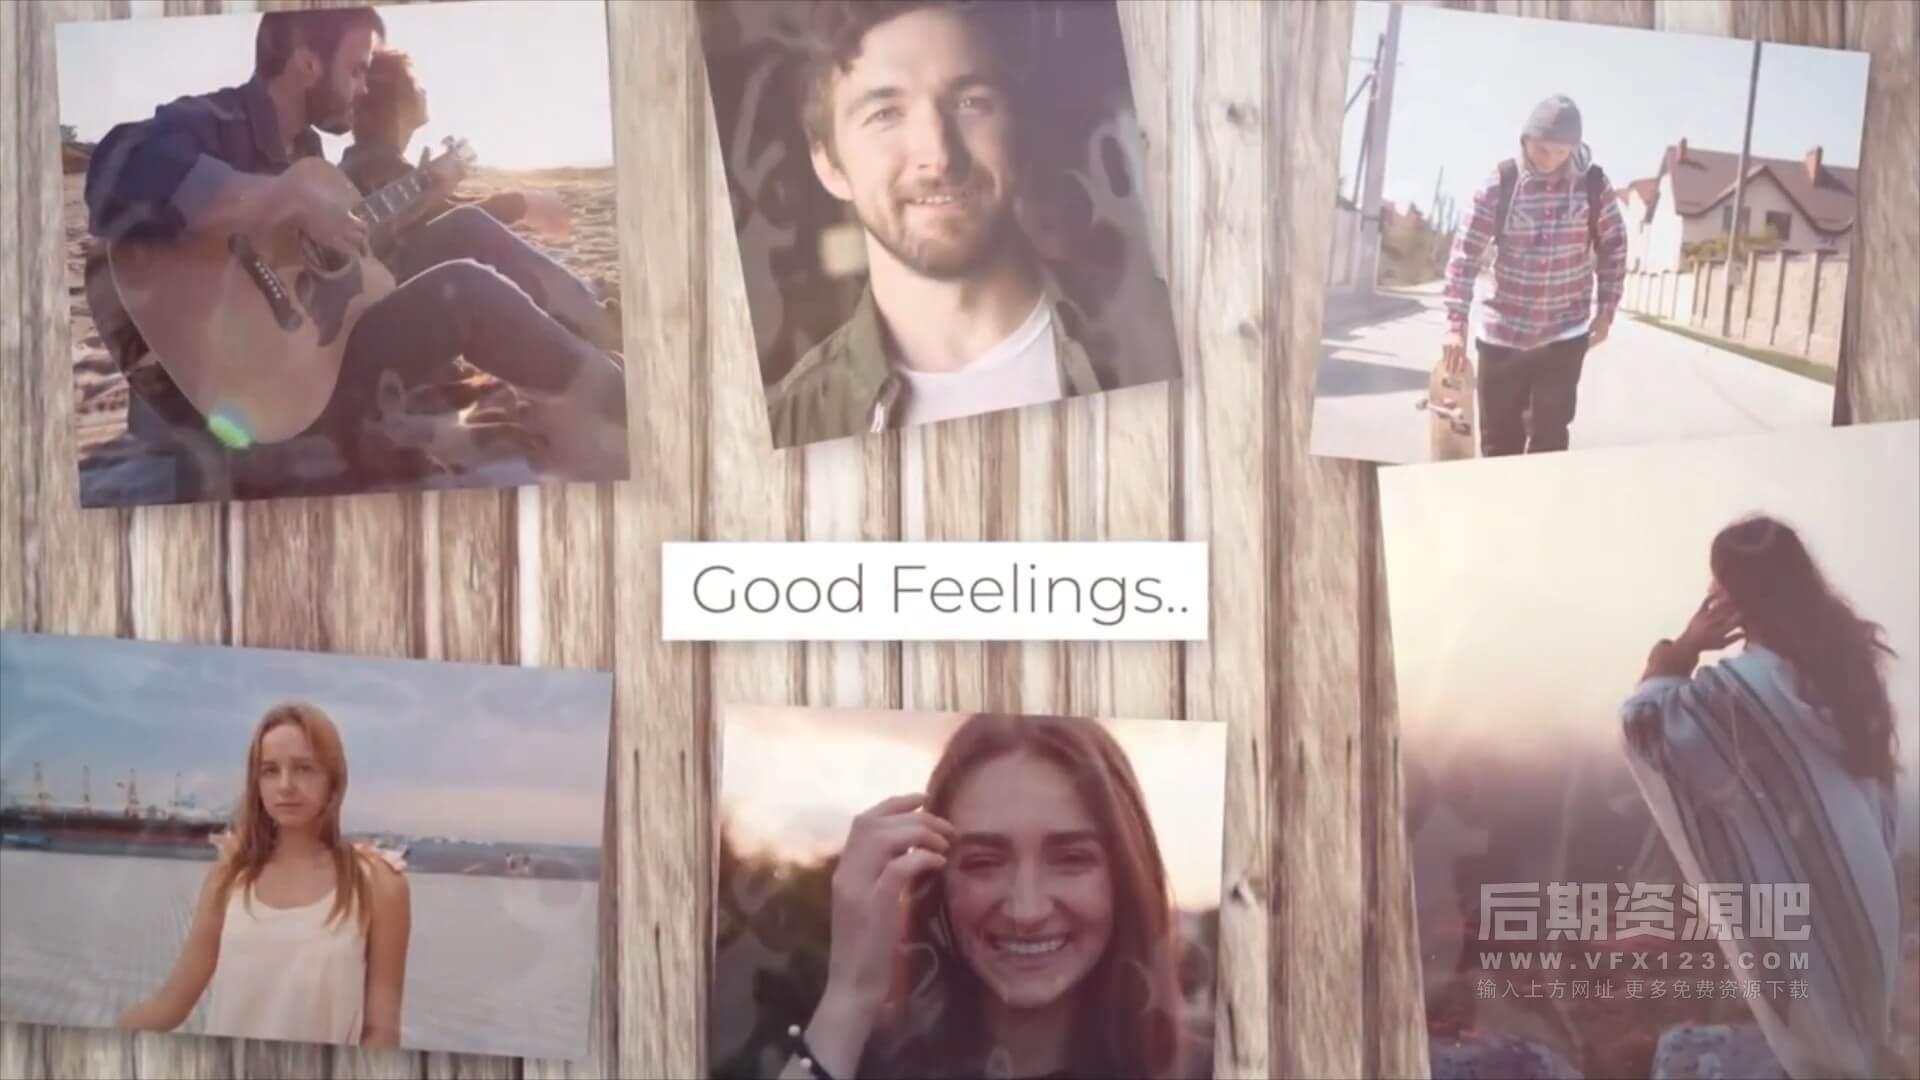 fcpx主题模板 清新优雅照片墙展示片头模板 Good Feelings